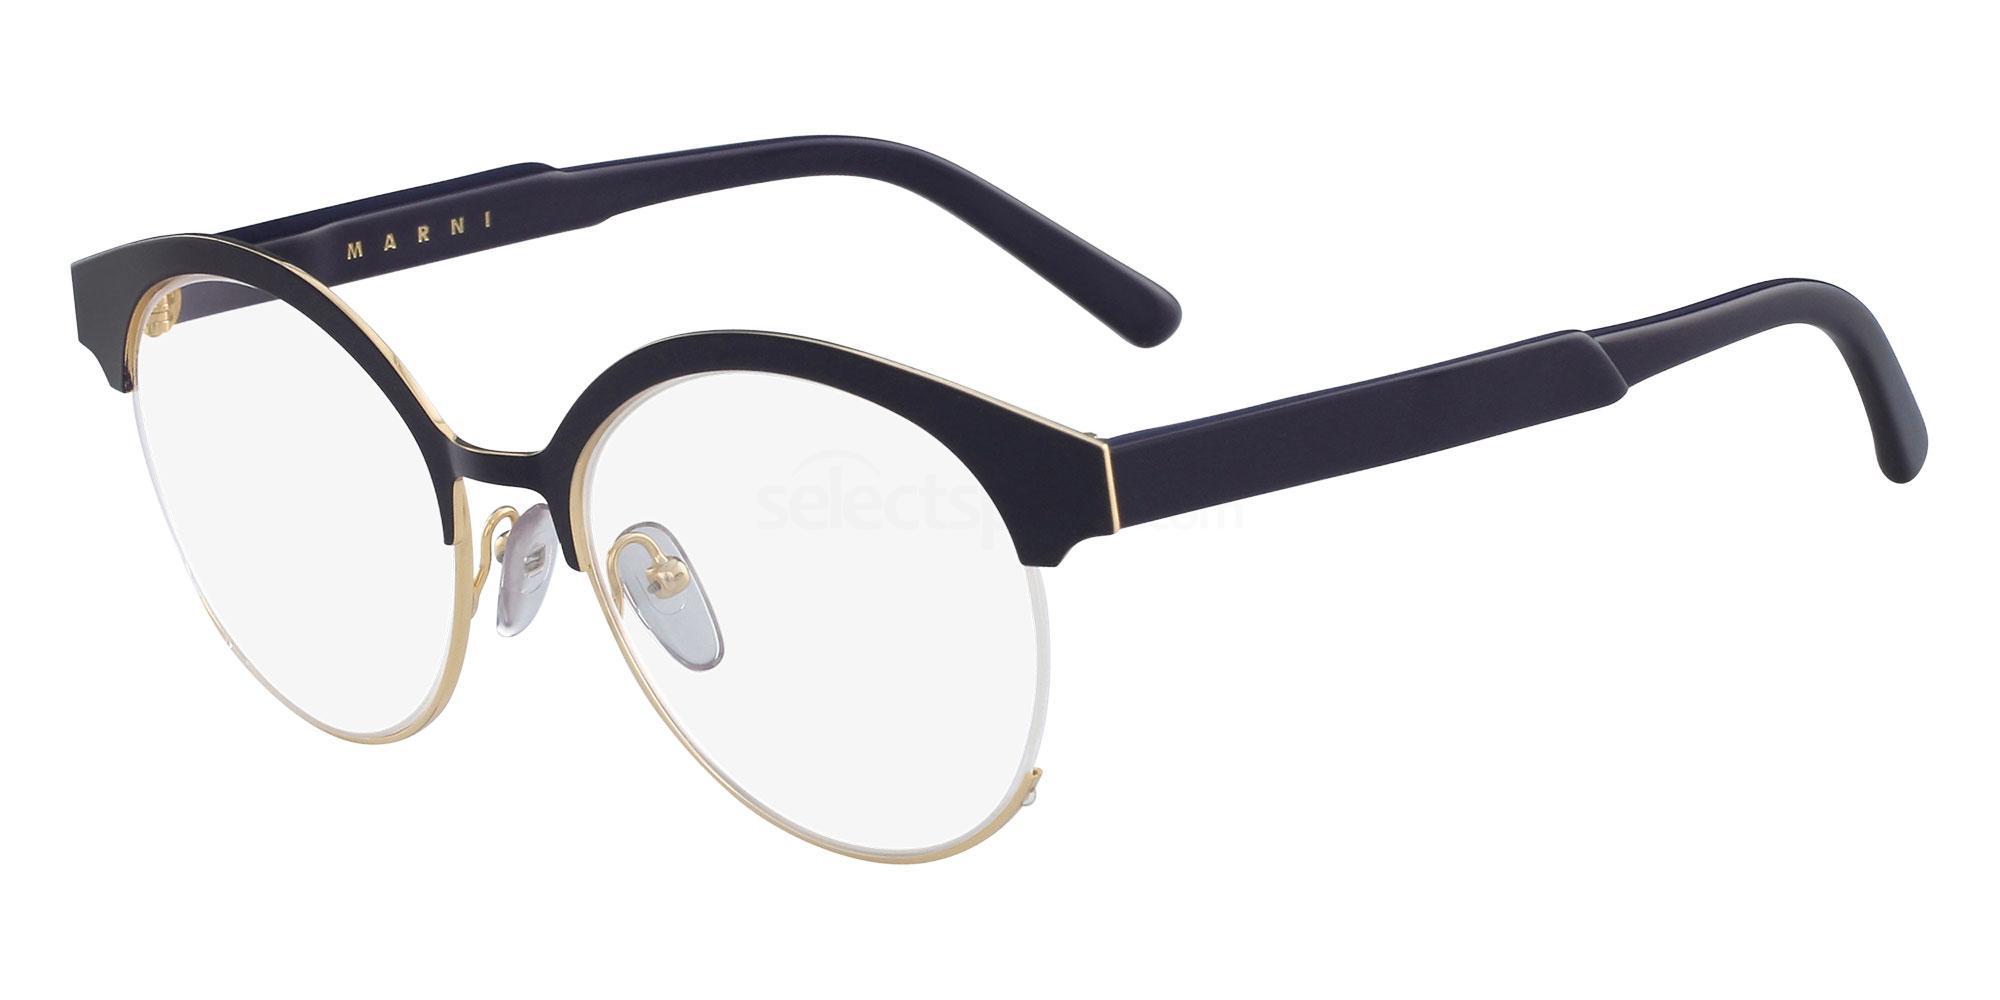 429 ME2102 Glasses, Marni